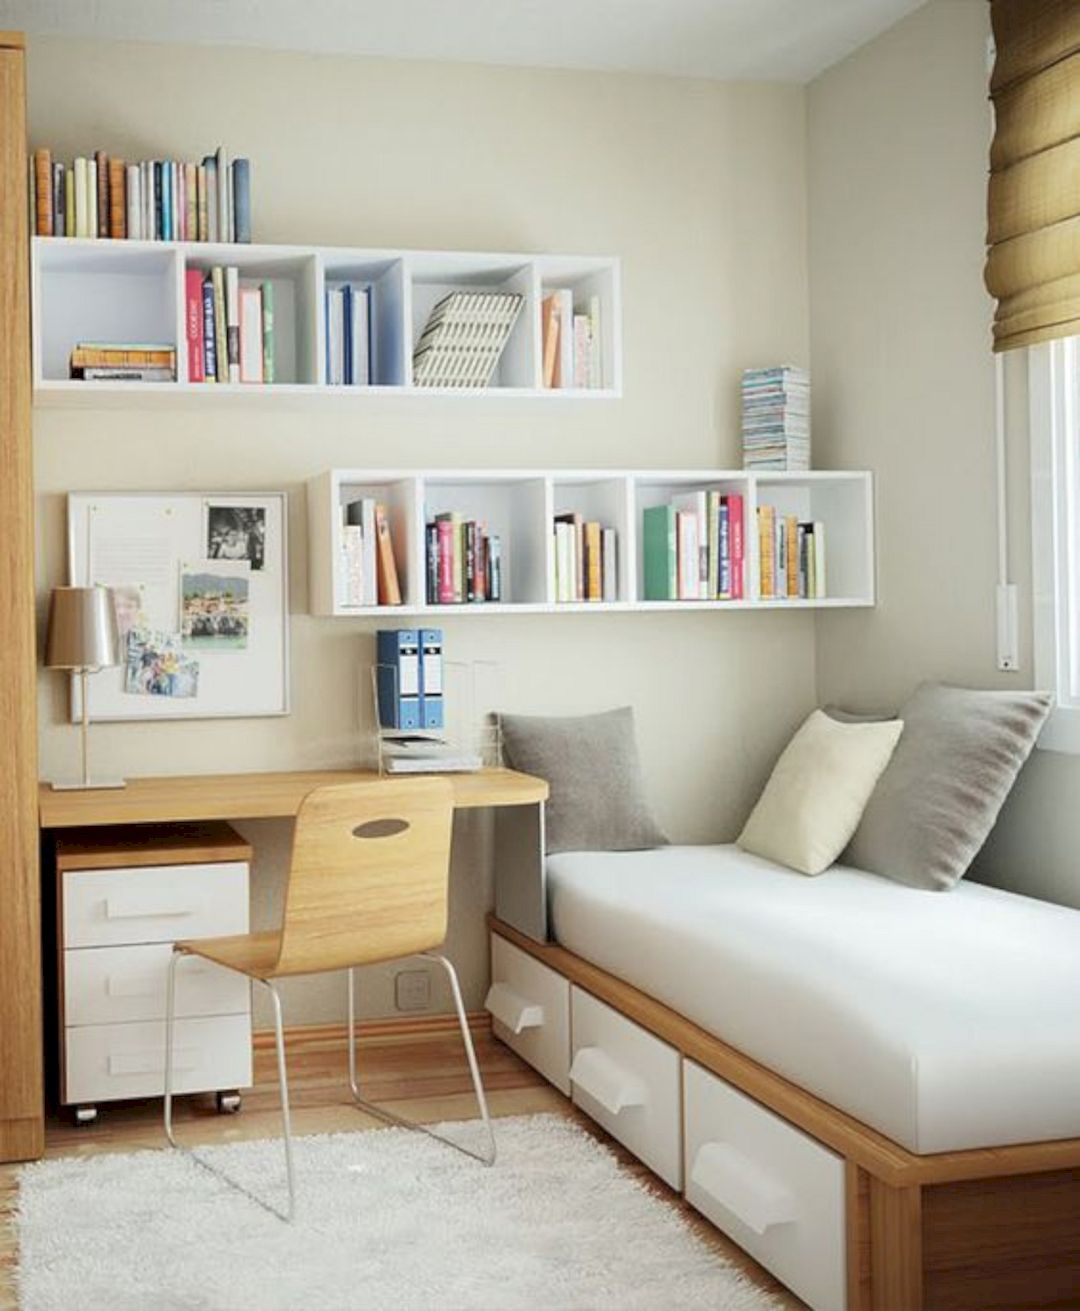 Artistic Your Dorm Room Furniture Ideas Your Dorm Room Dorm Room Dorm Room Furniture Setup Ideas Dorm Room Furniture Arrangement Ideas Furniture Ideas